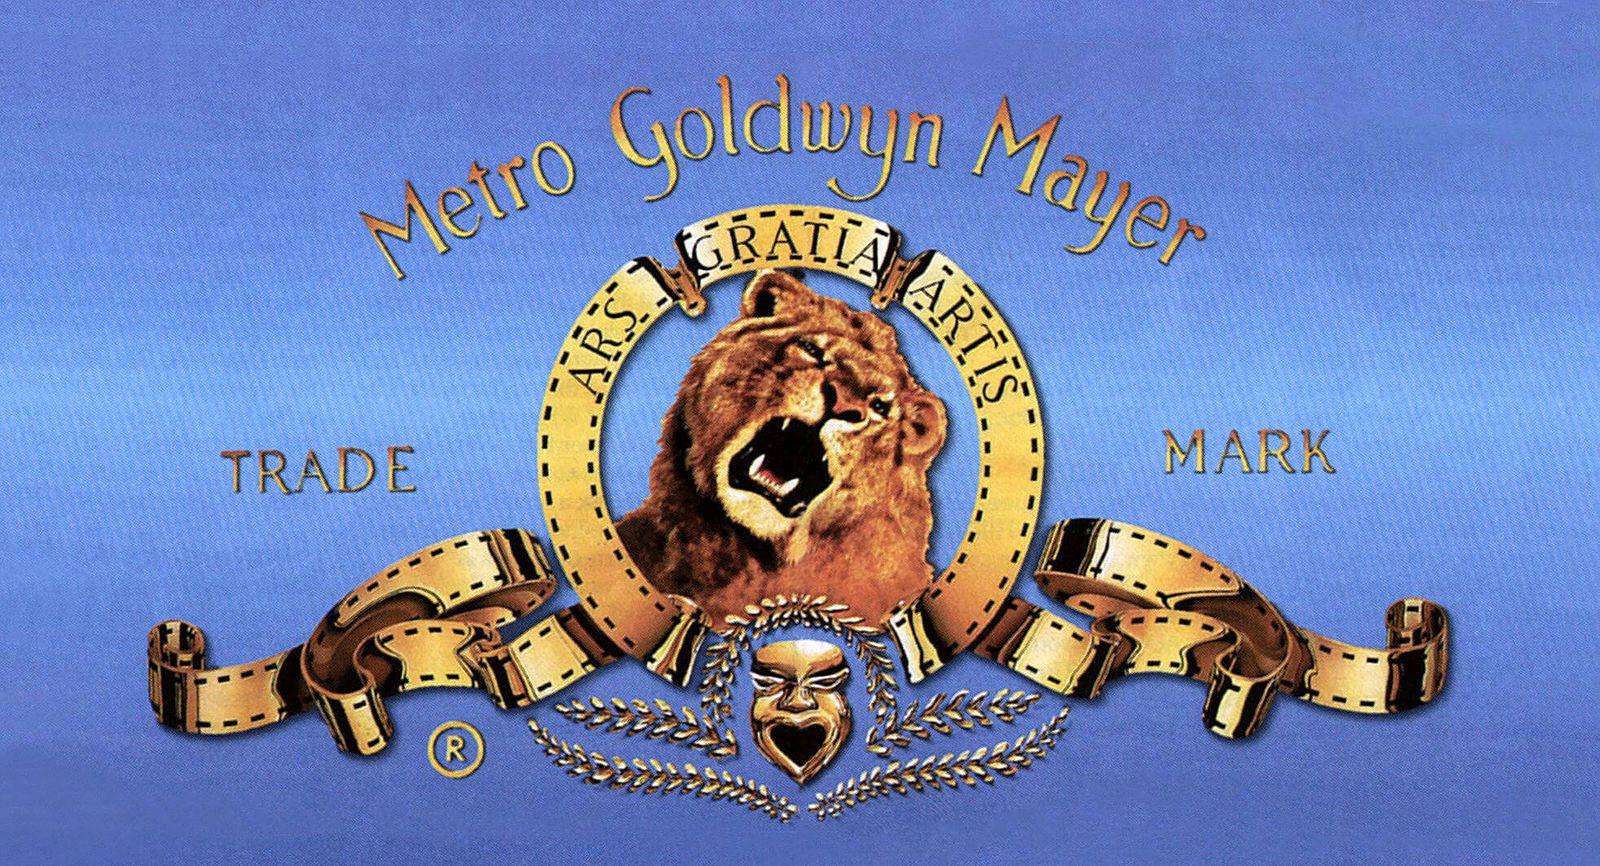 Metro Goldwyn Mayer Logo Film: Metro Goldwyn Mayer Logo (1990) 01 May 1990 PUBLICATIONxINxGERxSUIxAUTxONLY Copyright: Ma